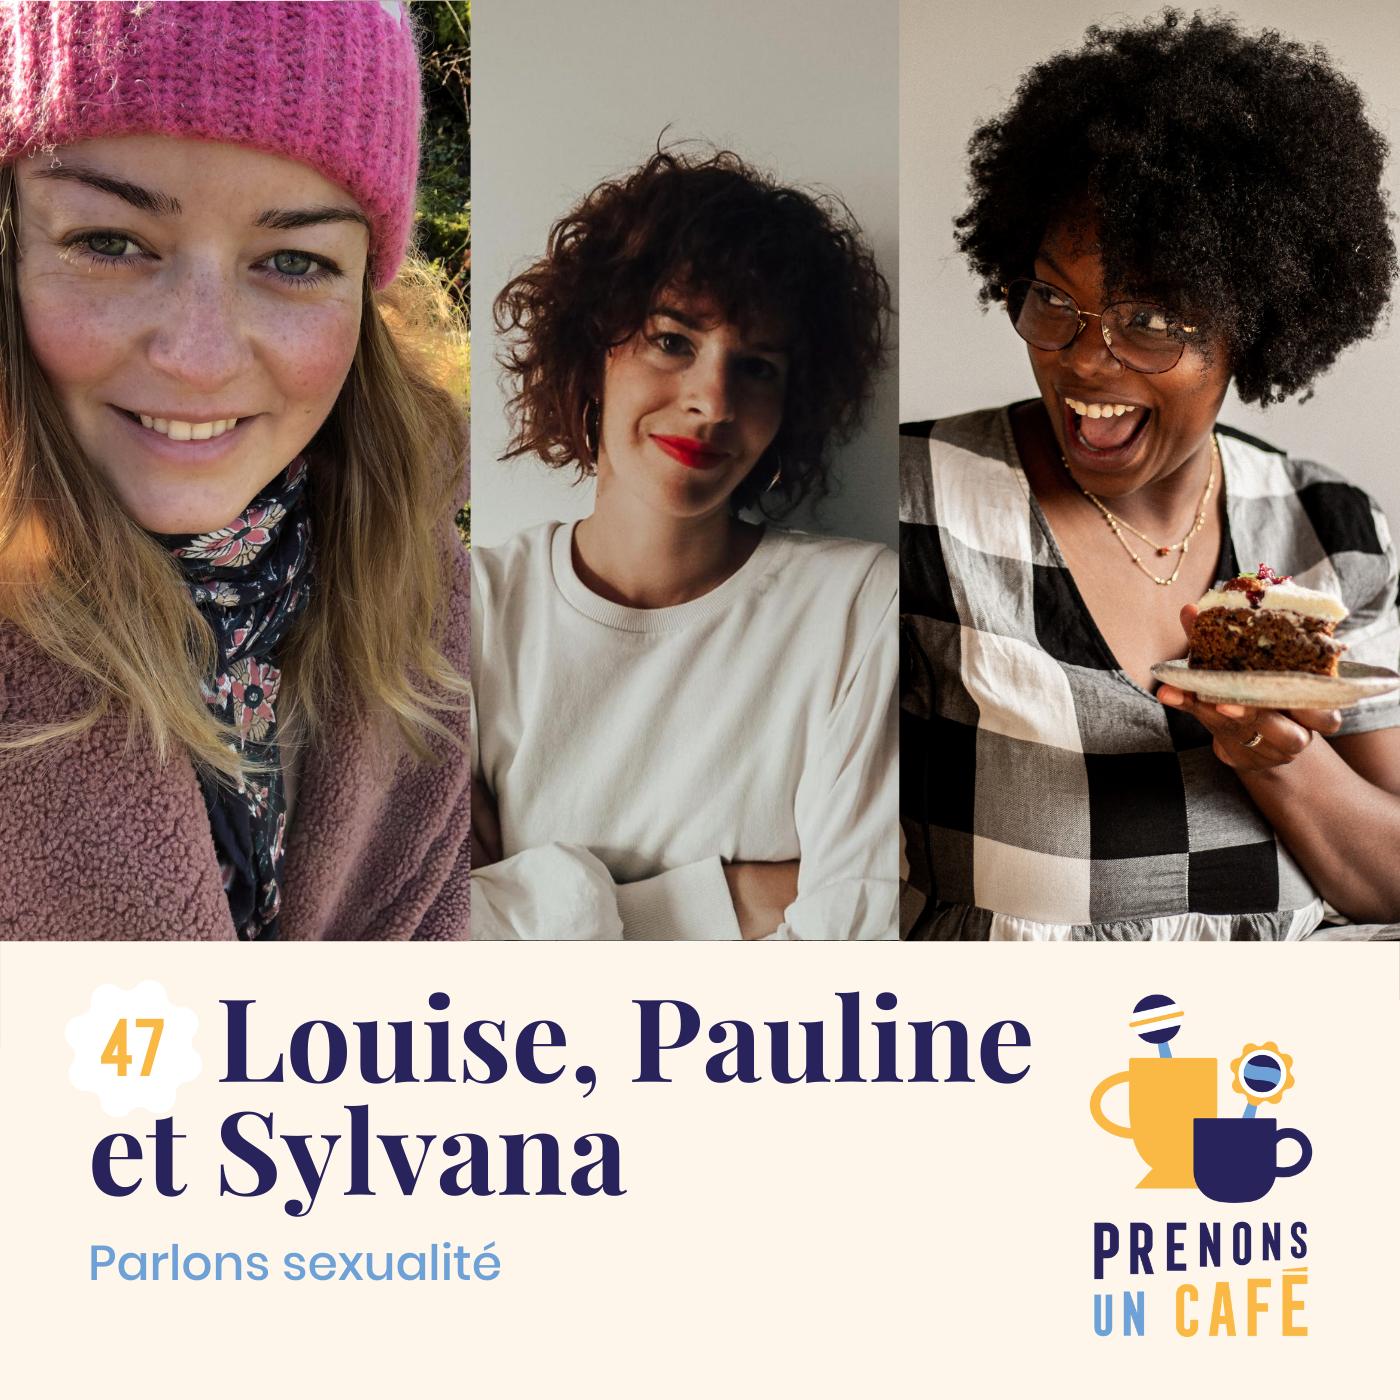 REPLAY - # 47 - Louise, Pauline et Sylvana - Parlons sexualité